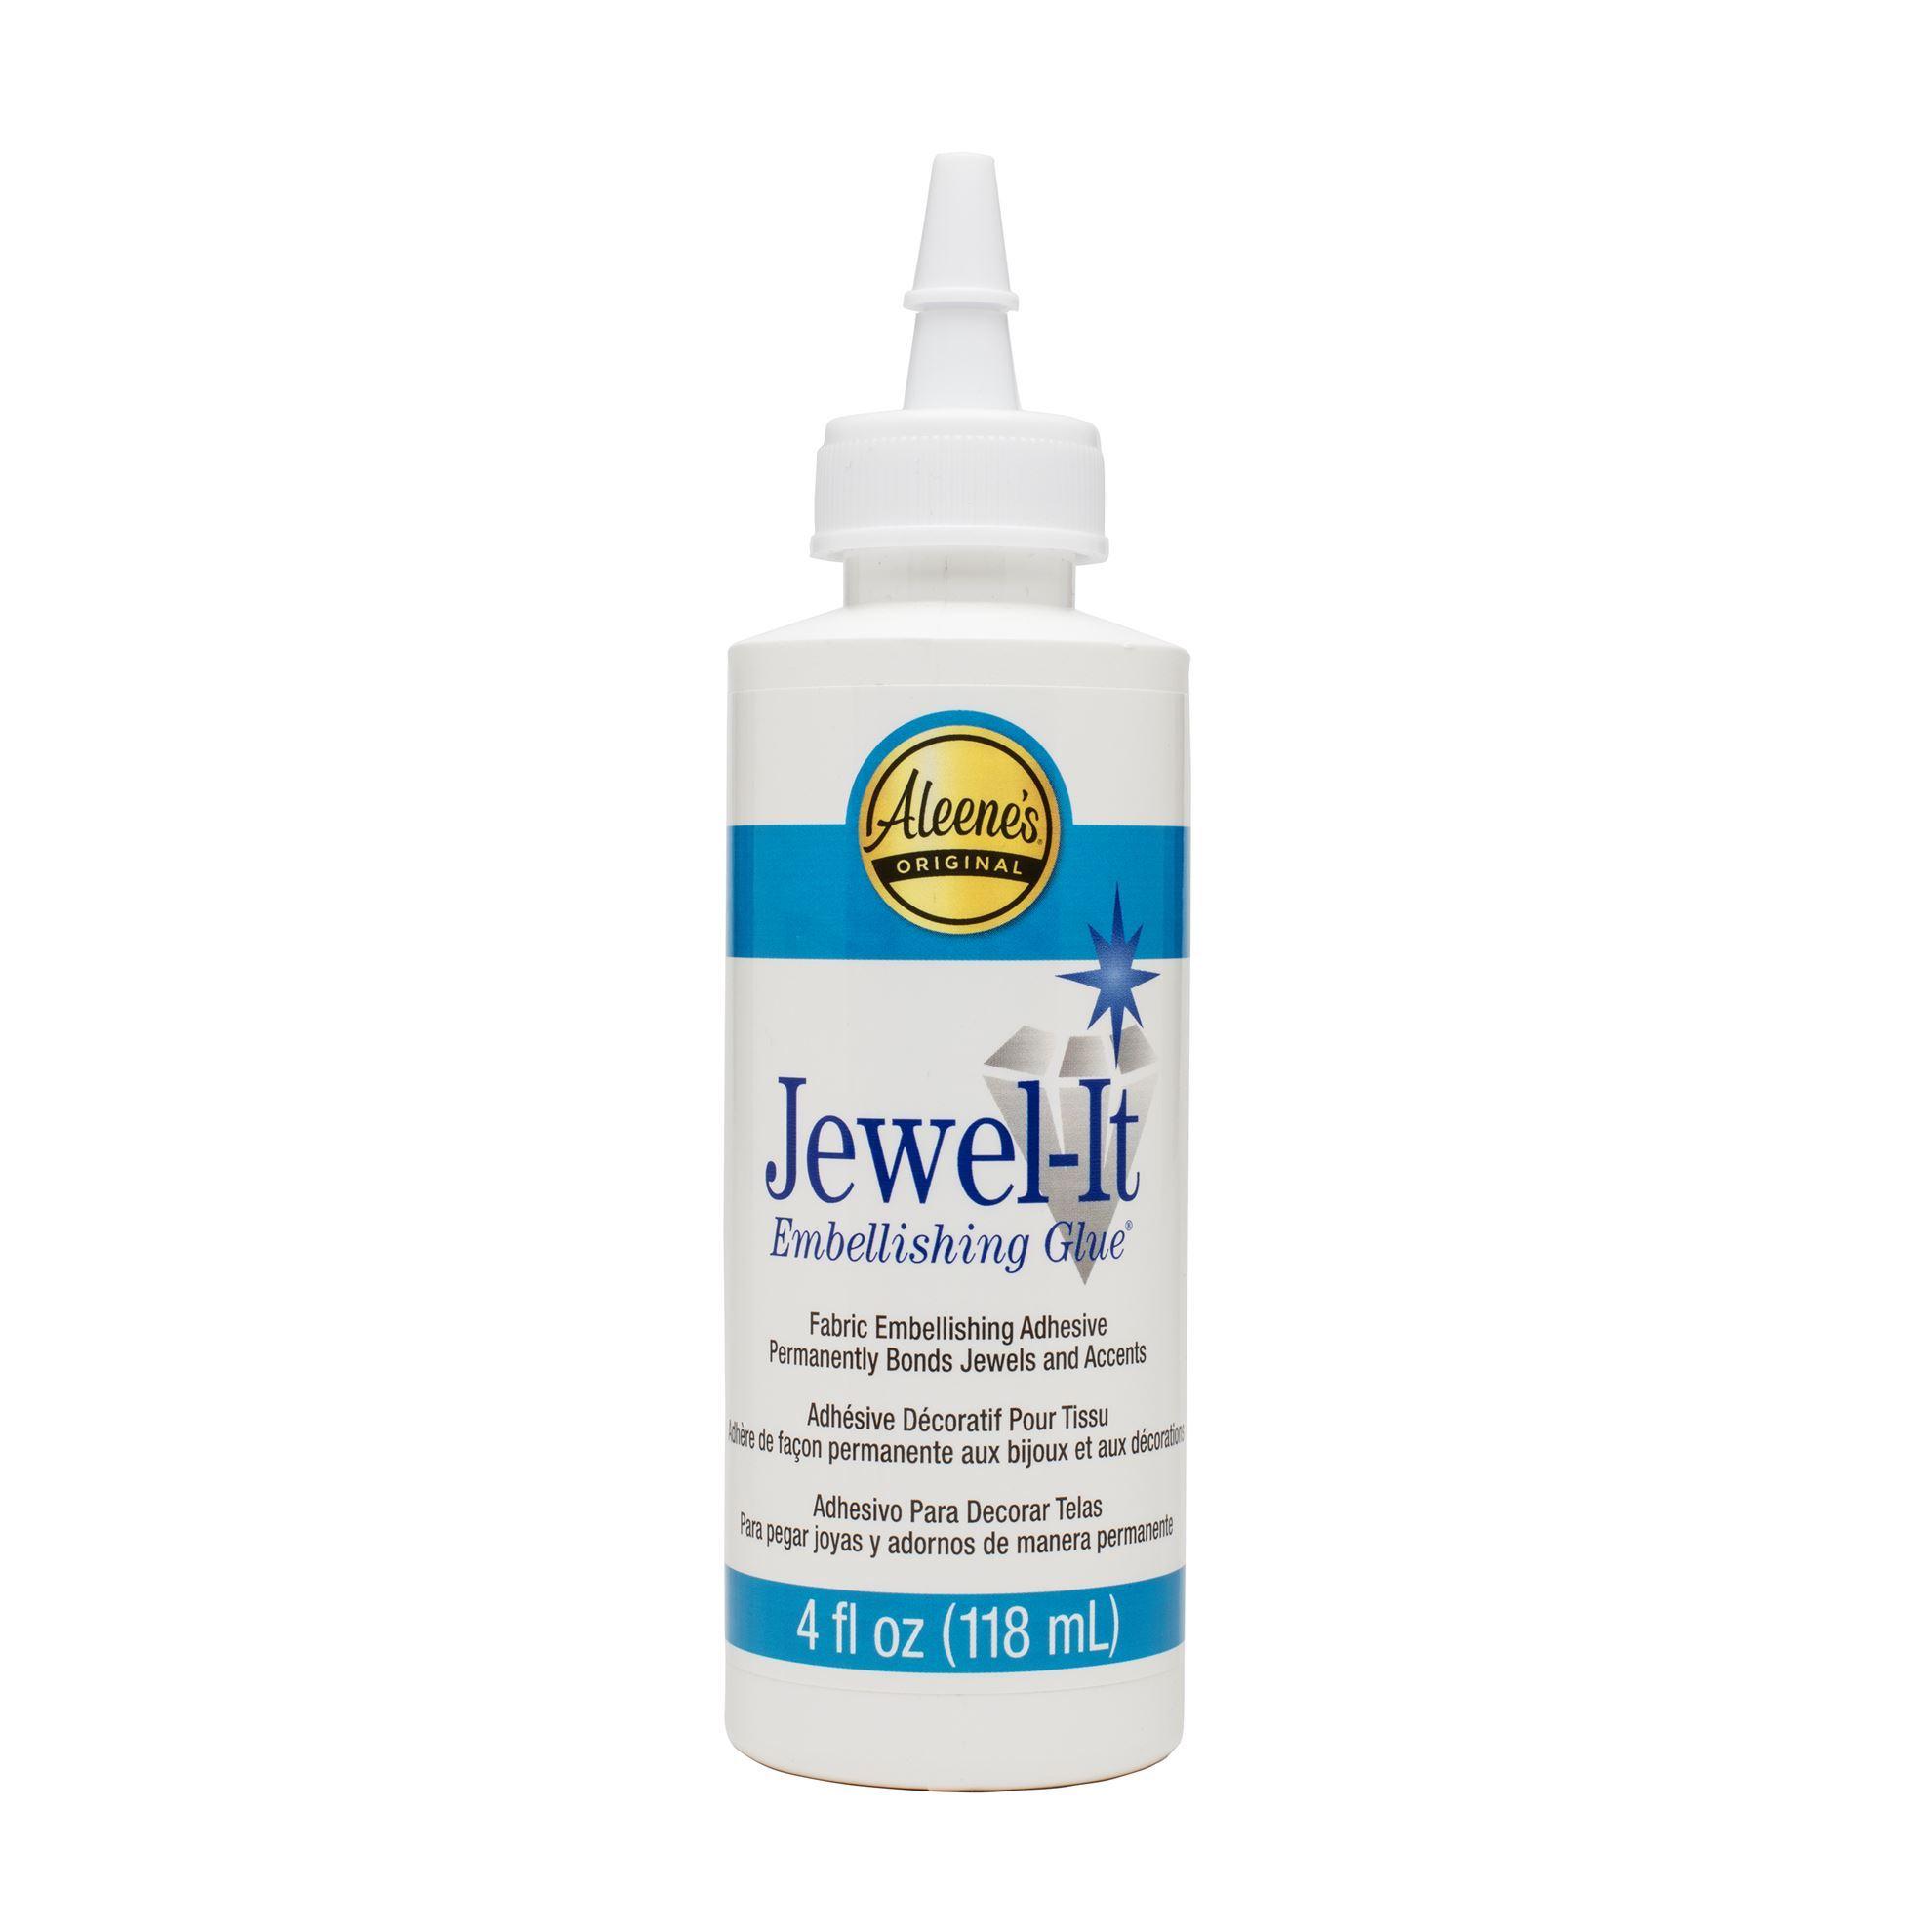 Aleene's® Jewel-It™ Embellishing Glue